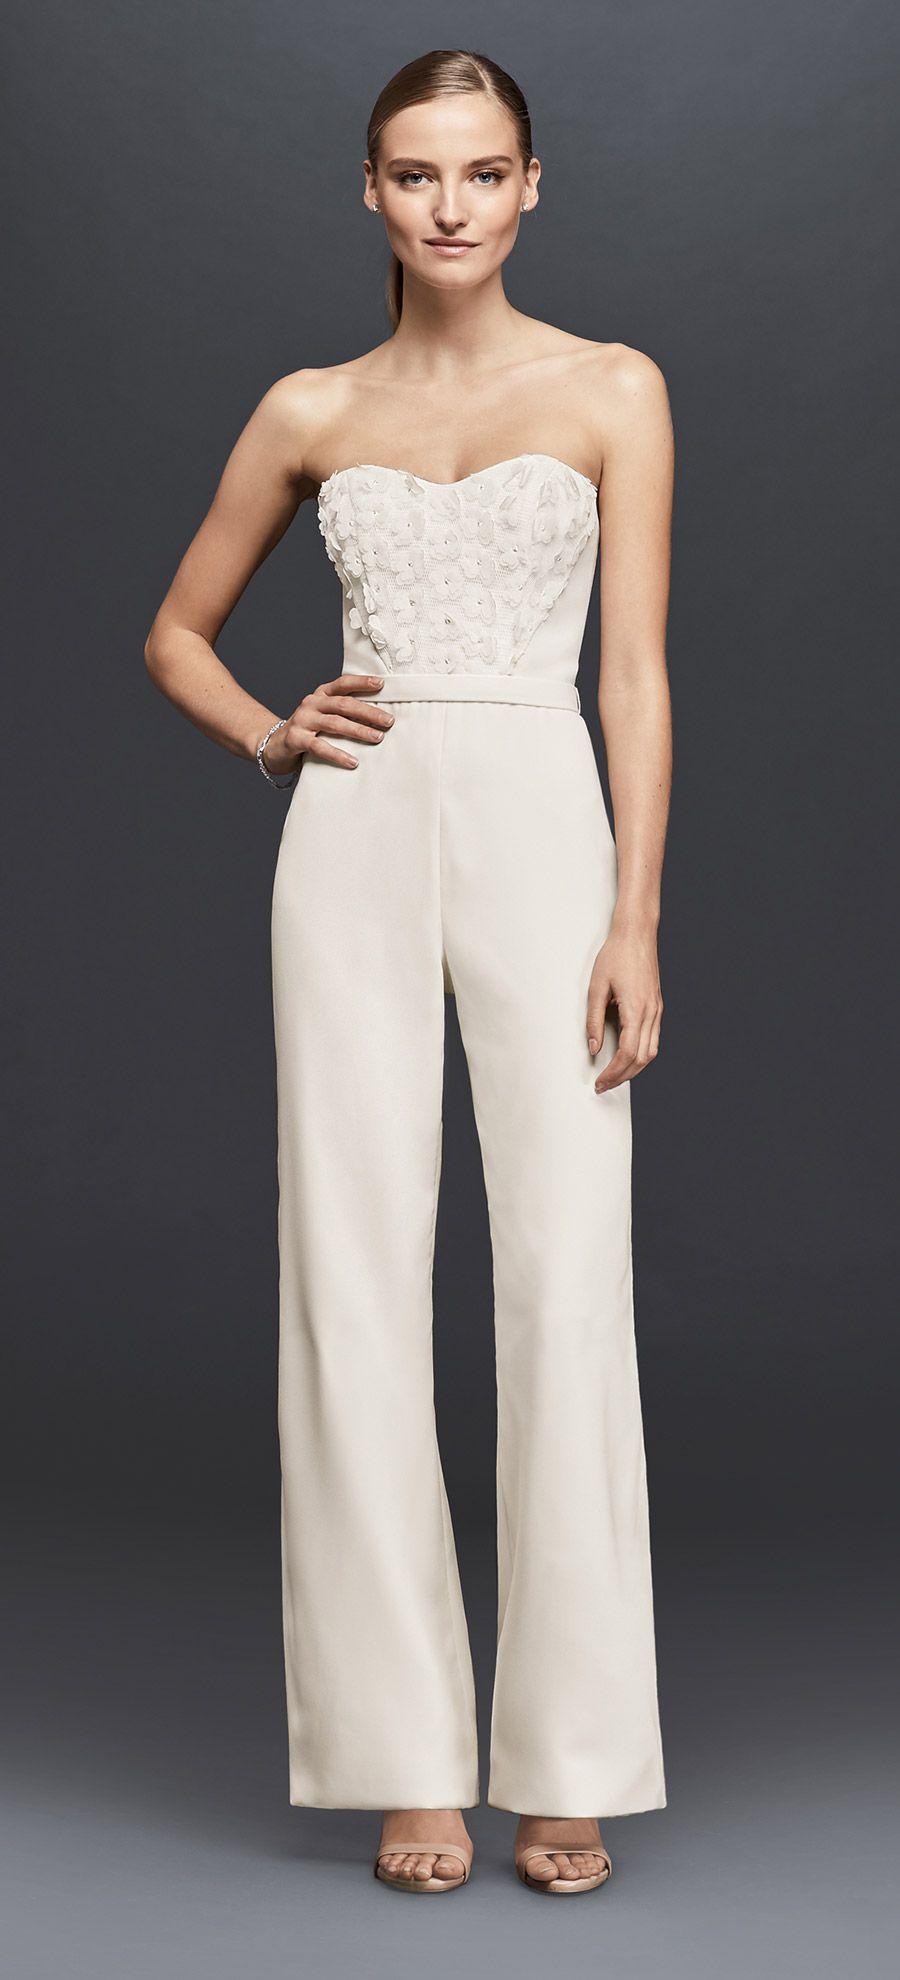 Strapless Crepe Jumpsuit with 20D Floral Details   David's Bridal ...